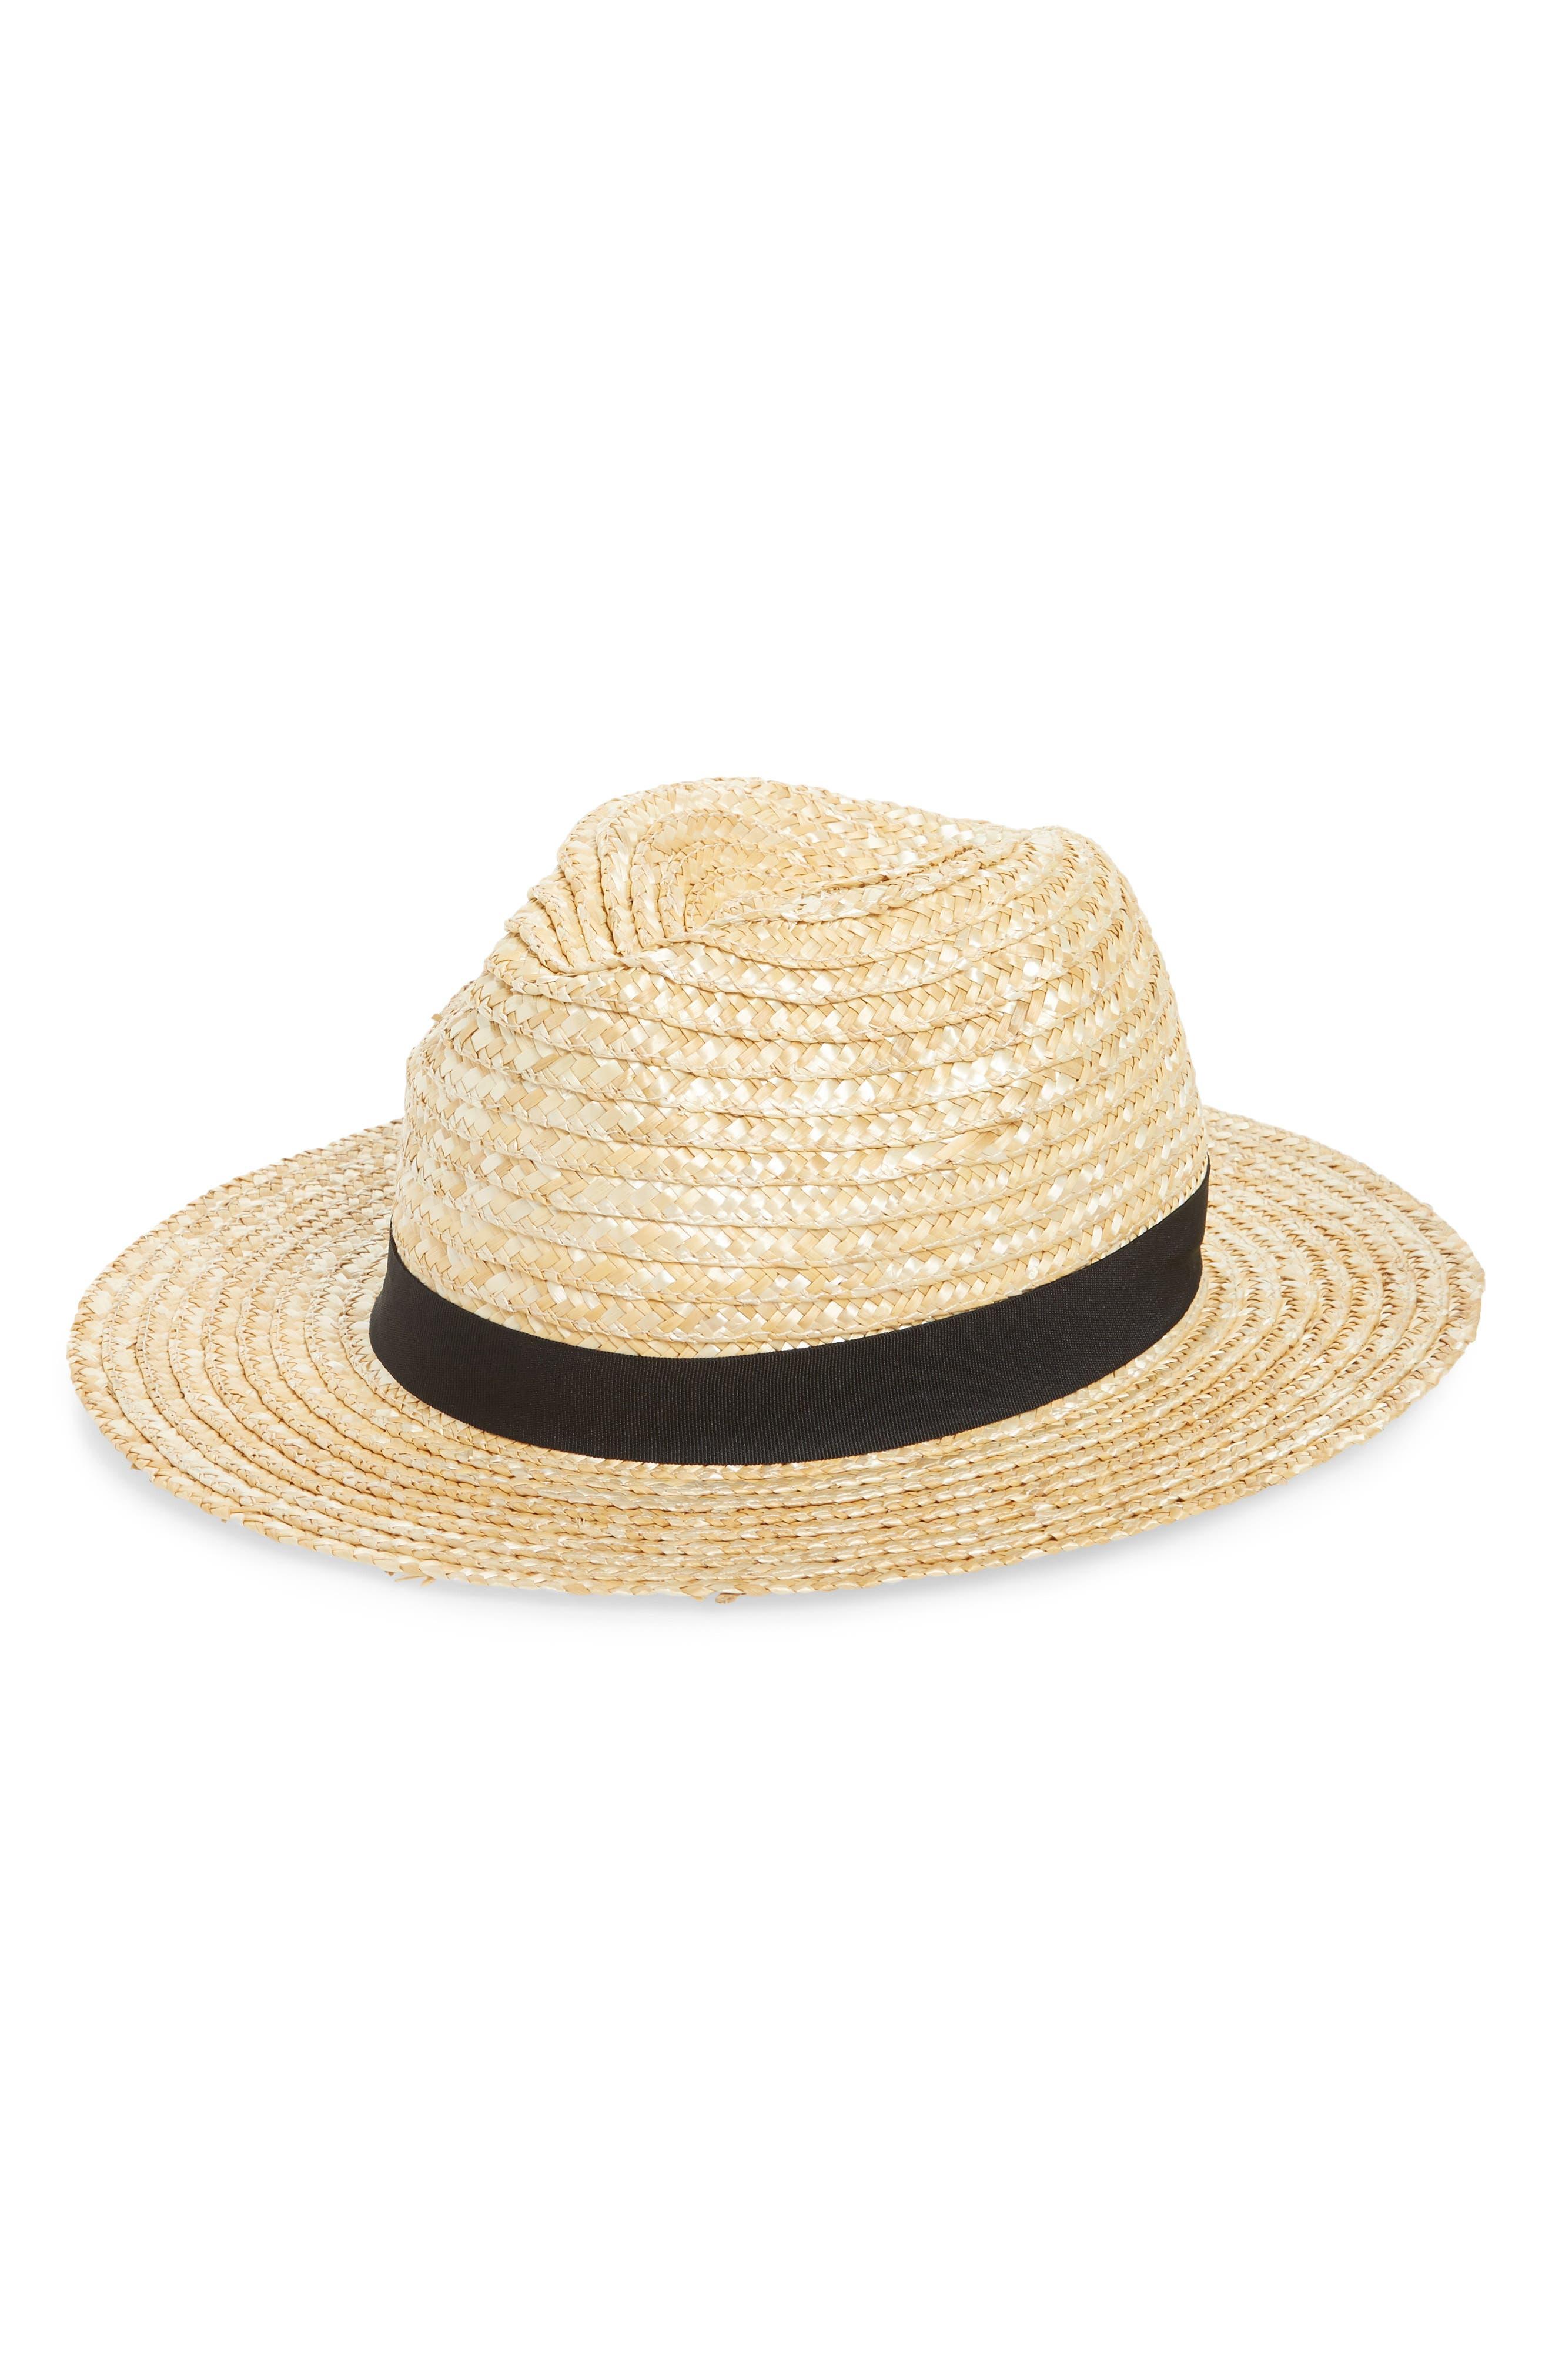 Braided Panama Hat,                         Main,                         color, 250